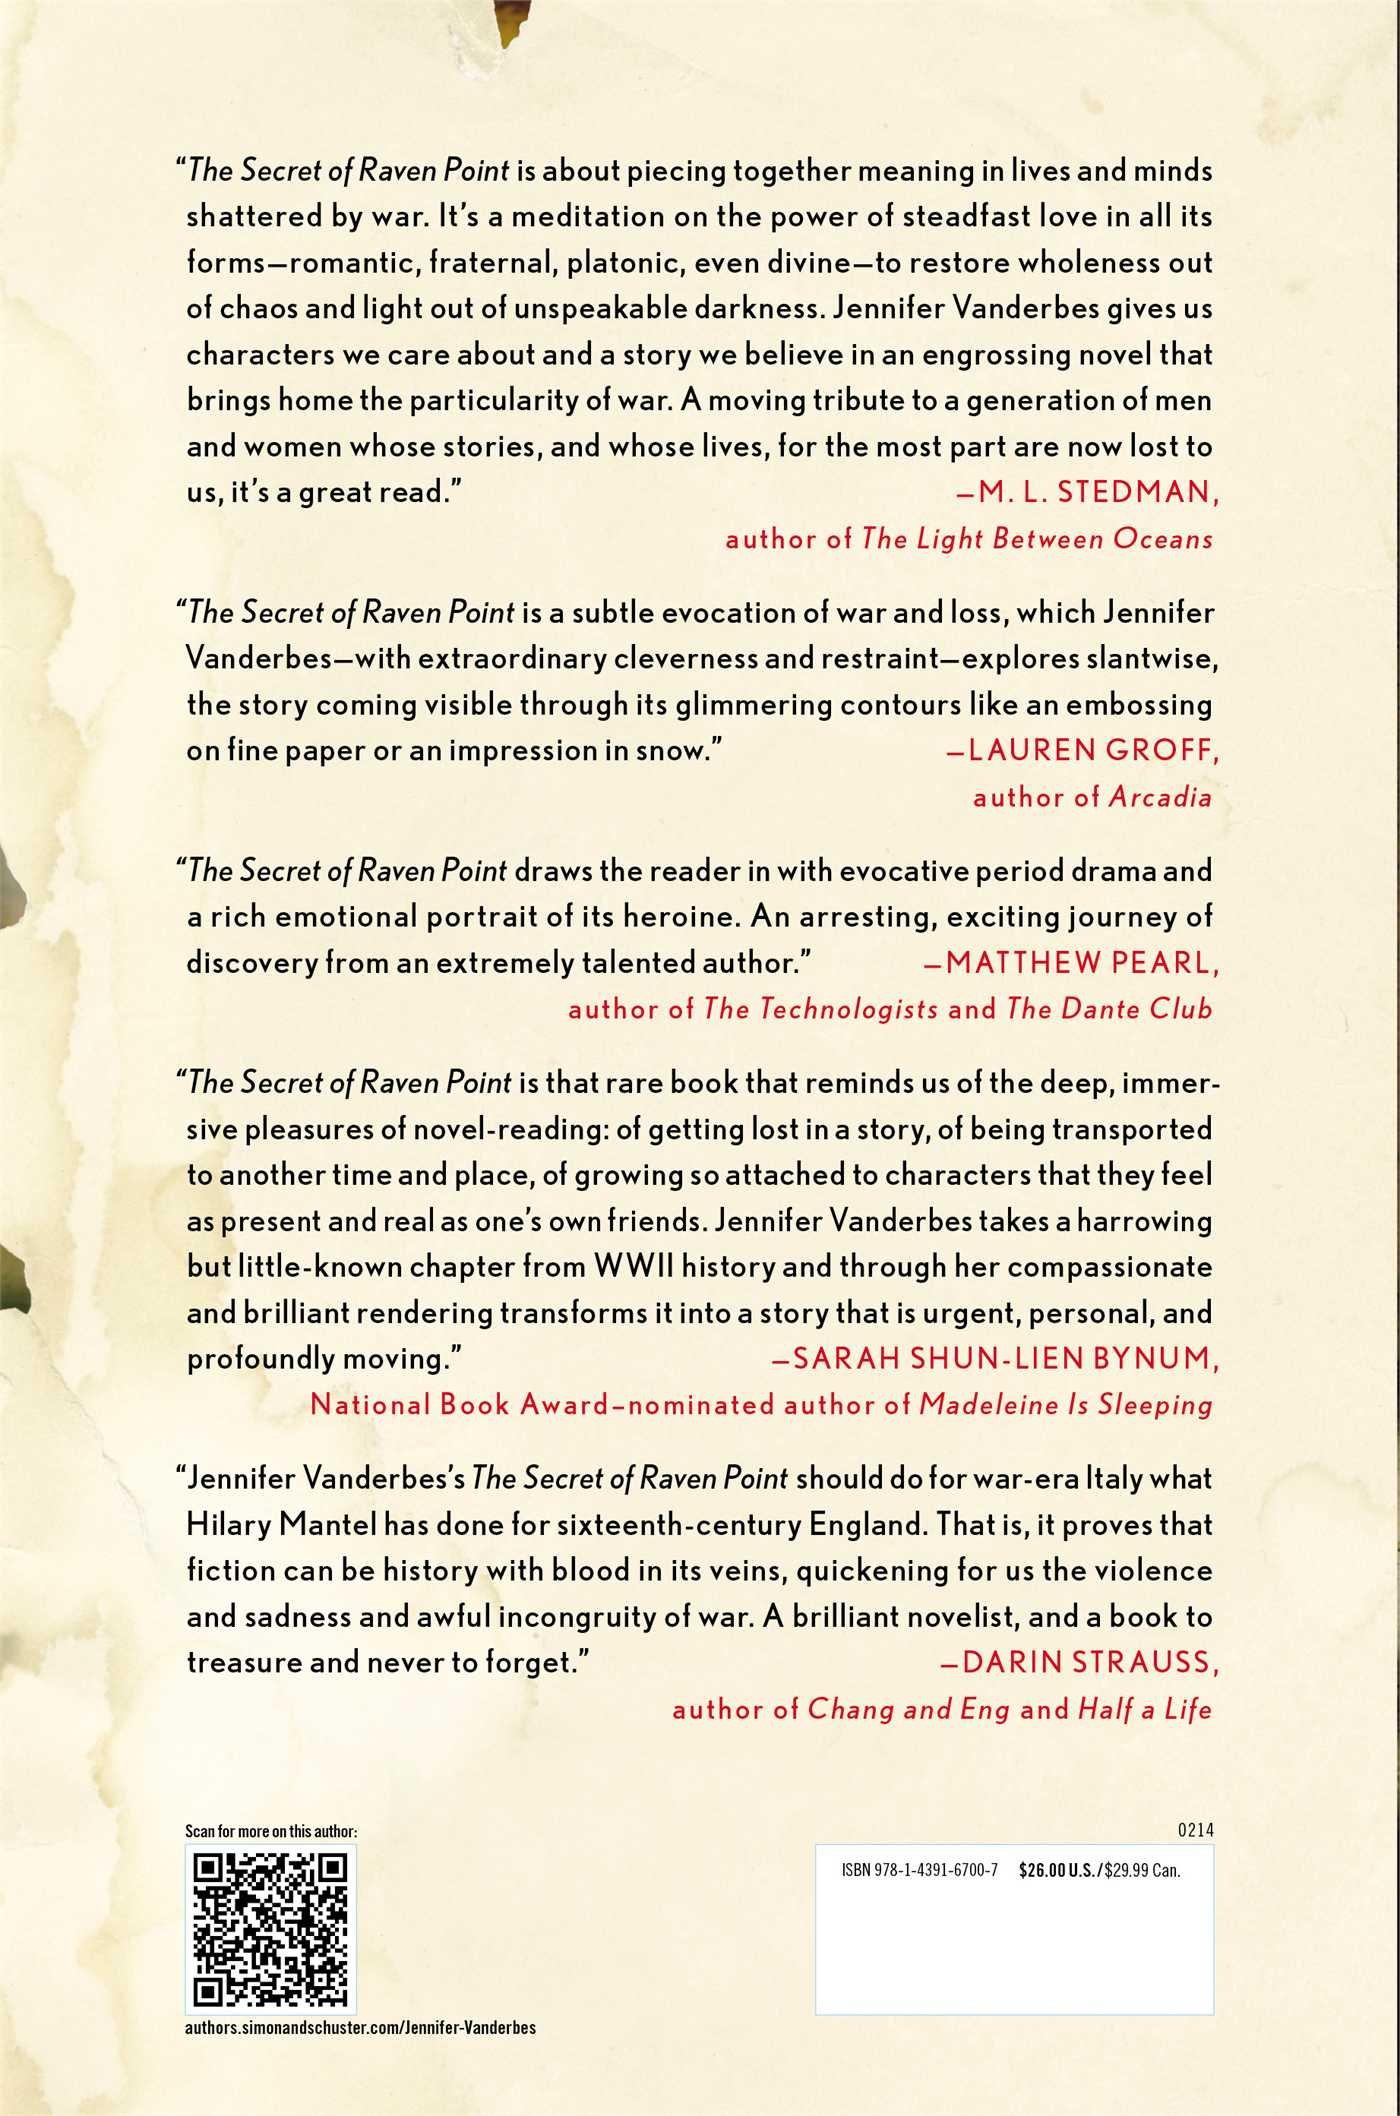 Amazon: The Secret Of Raven Point: A Novel (9781439167007  Amazon  The Secret Of Raven Point A Novel 9781439167007